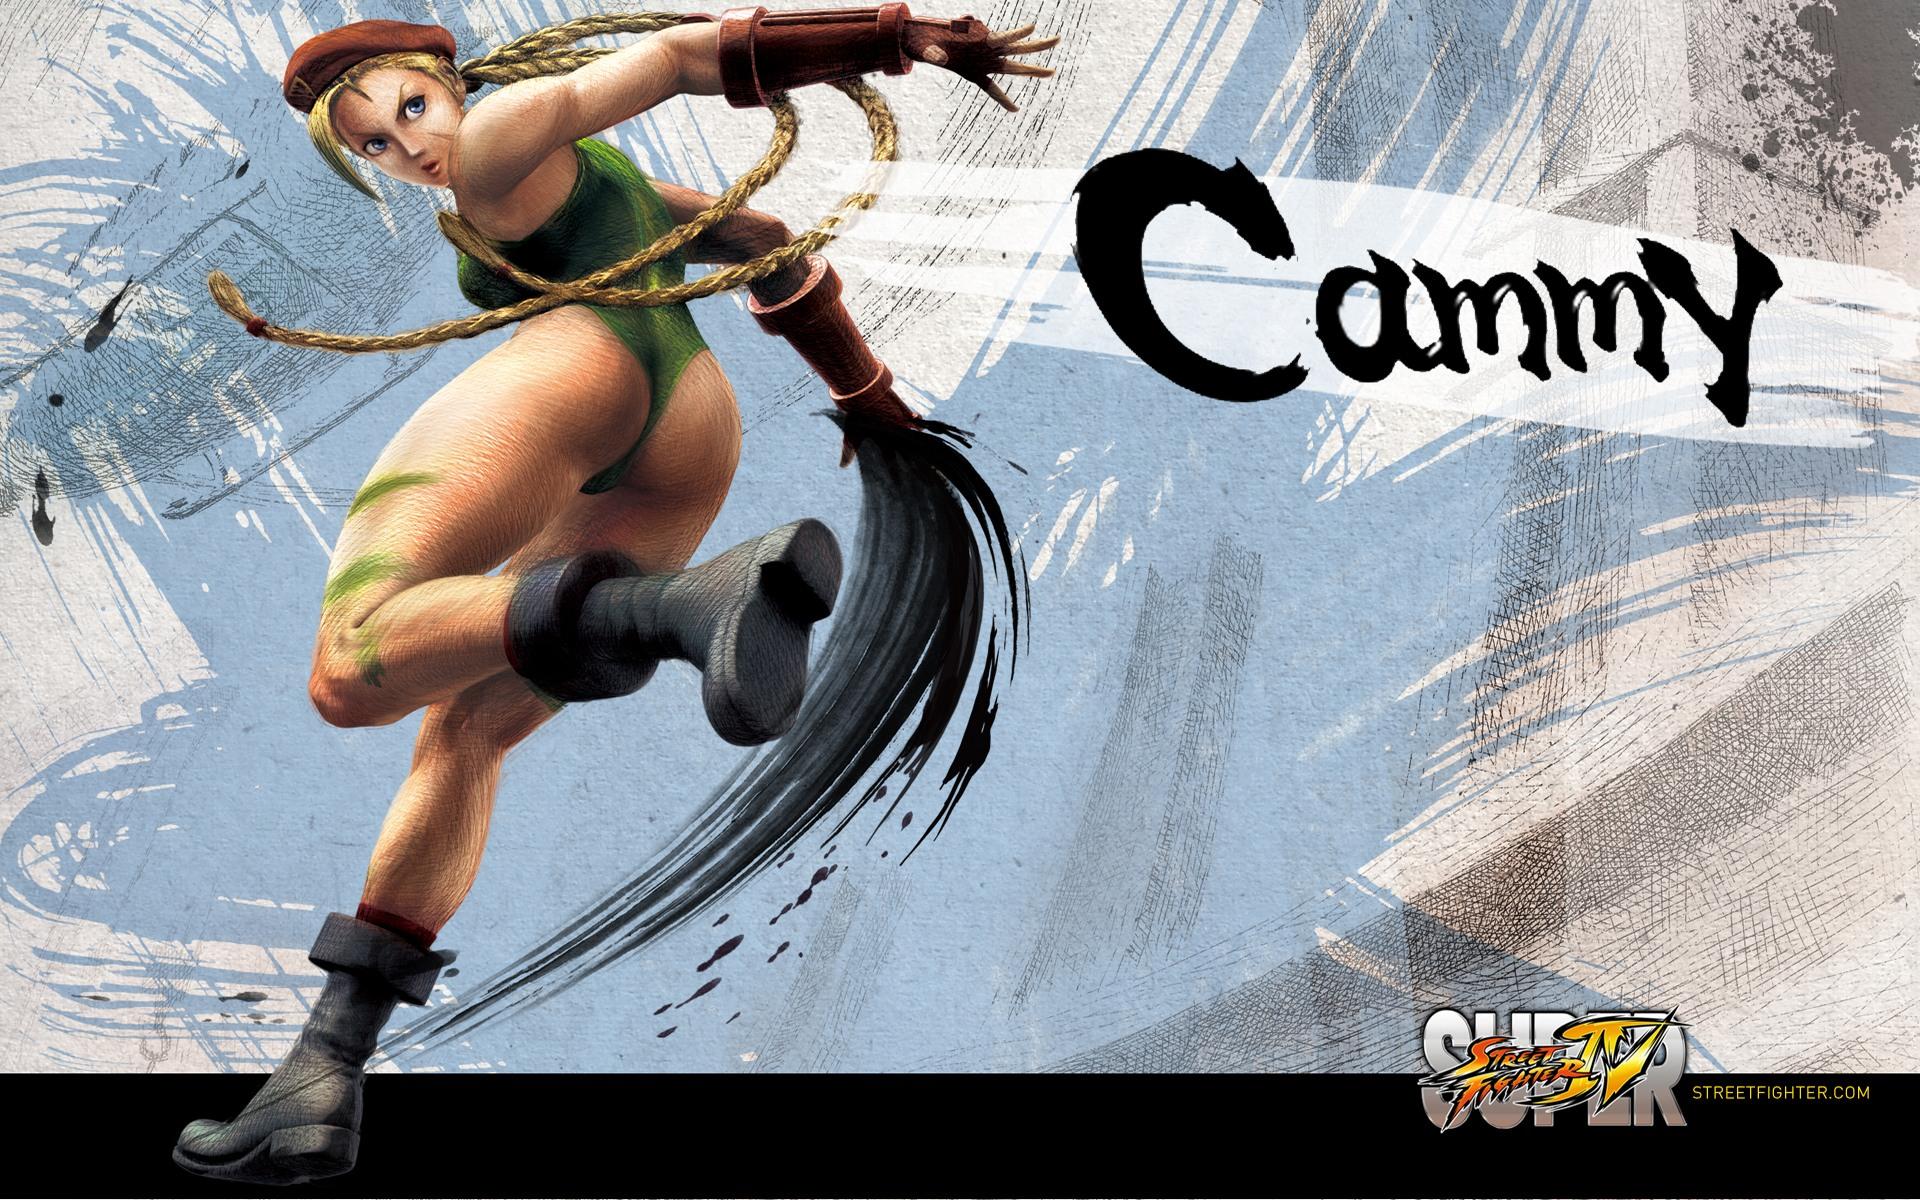 Cammy Street Fighter Wallpaper - WallpaperSafari